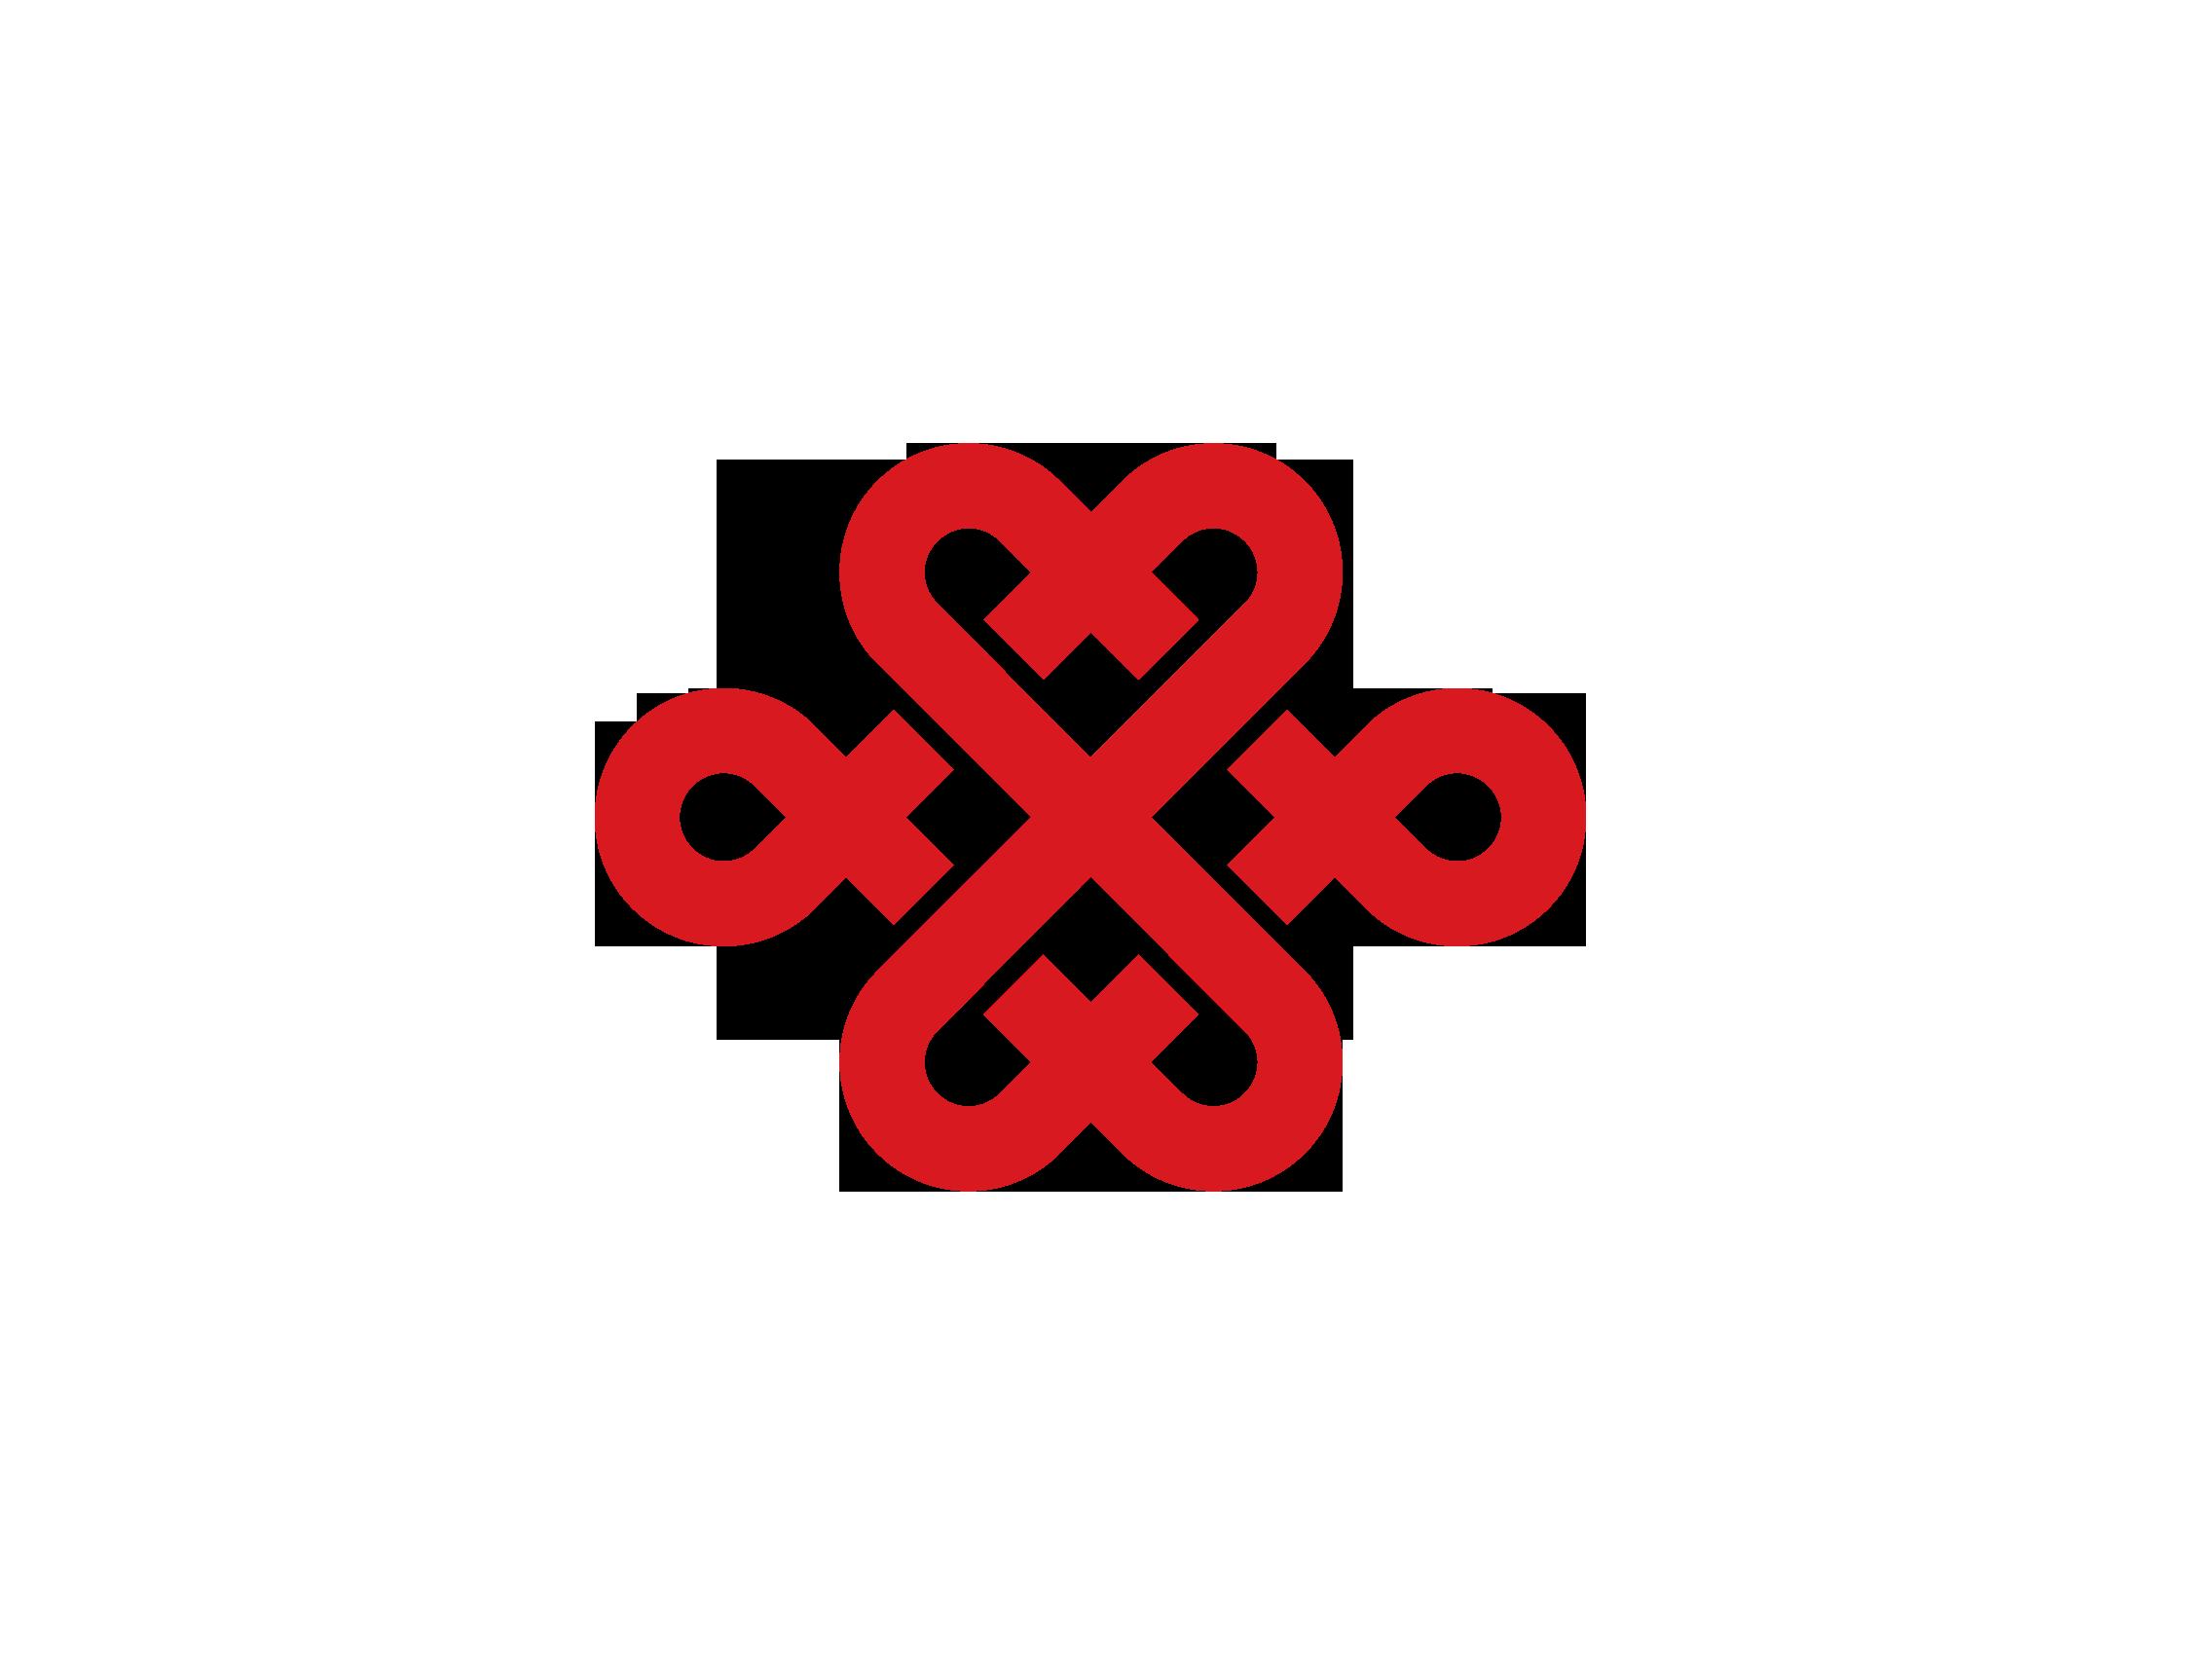 Chinese Knot Google Search Restaurant Logo Design Logos China Unicom